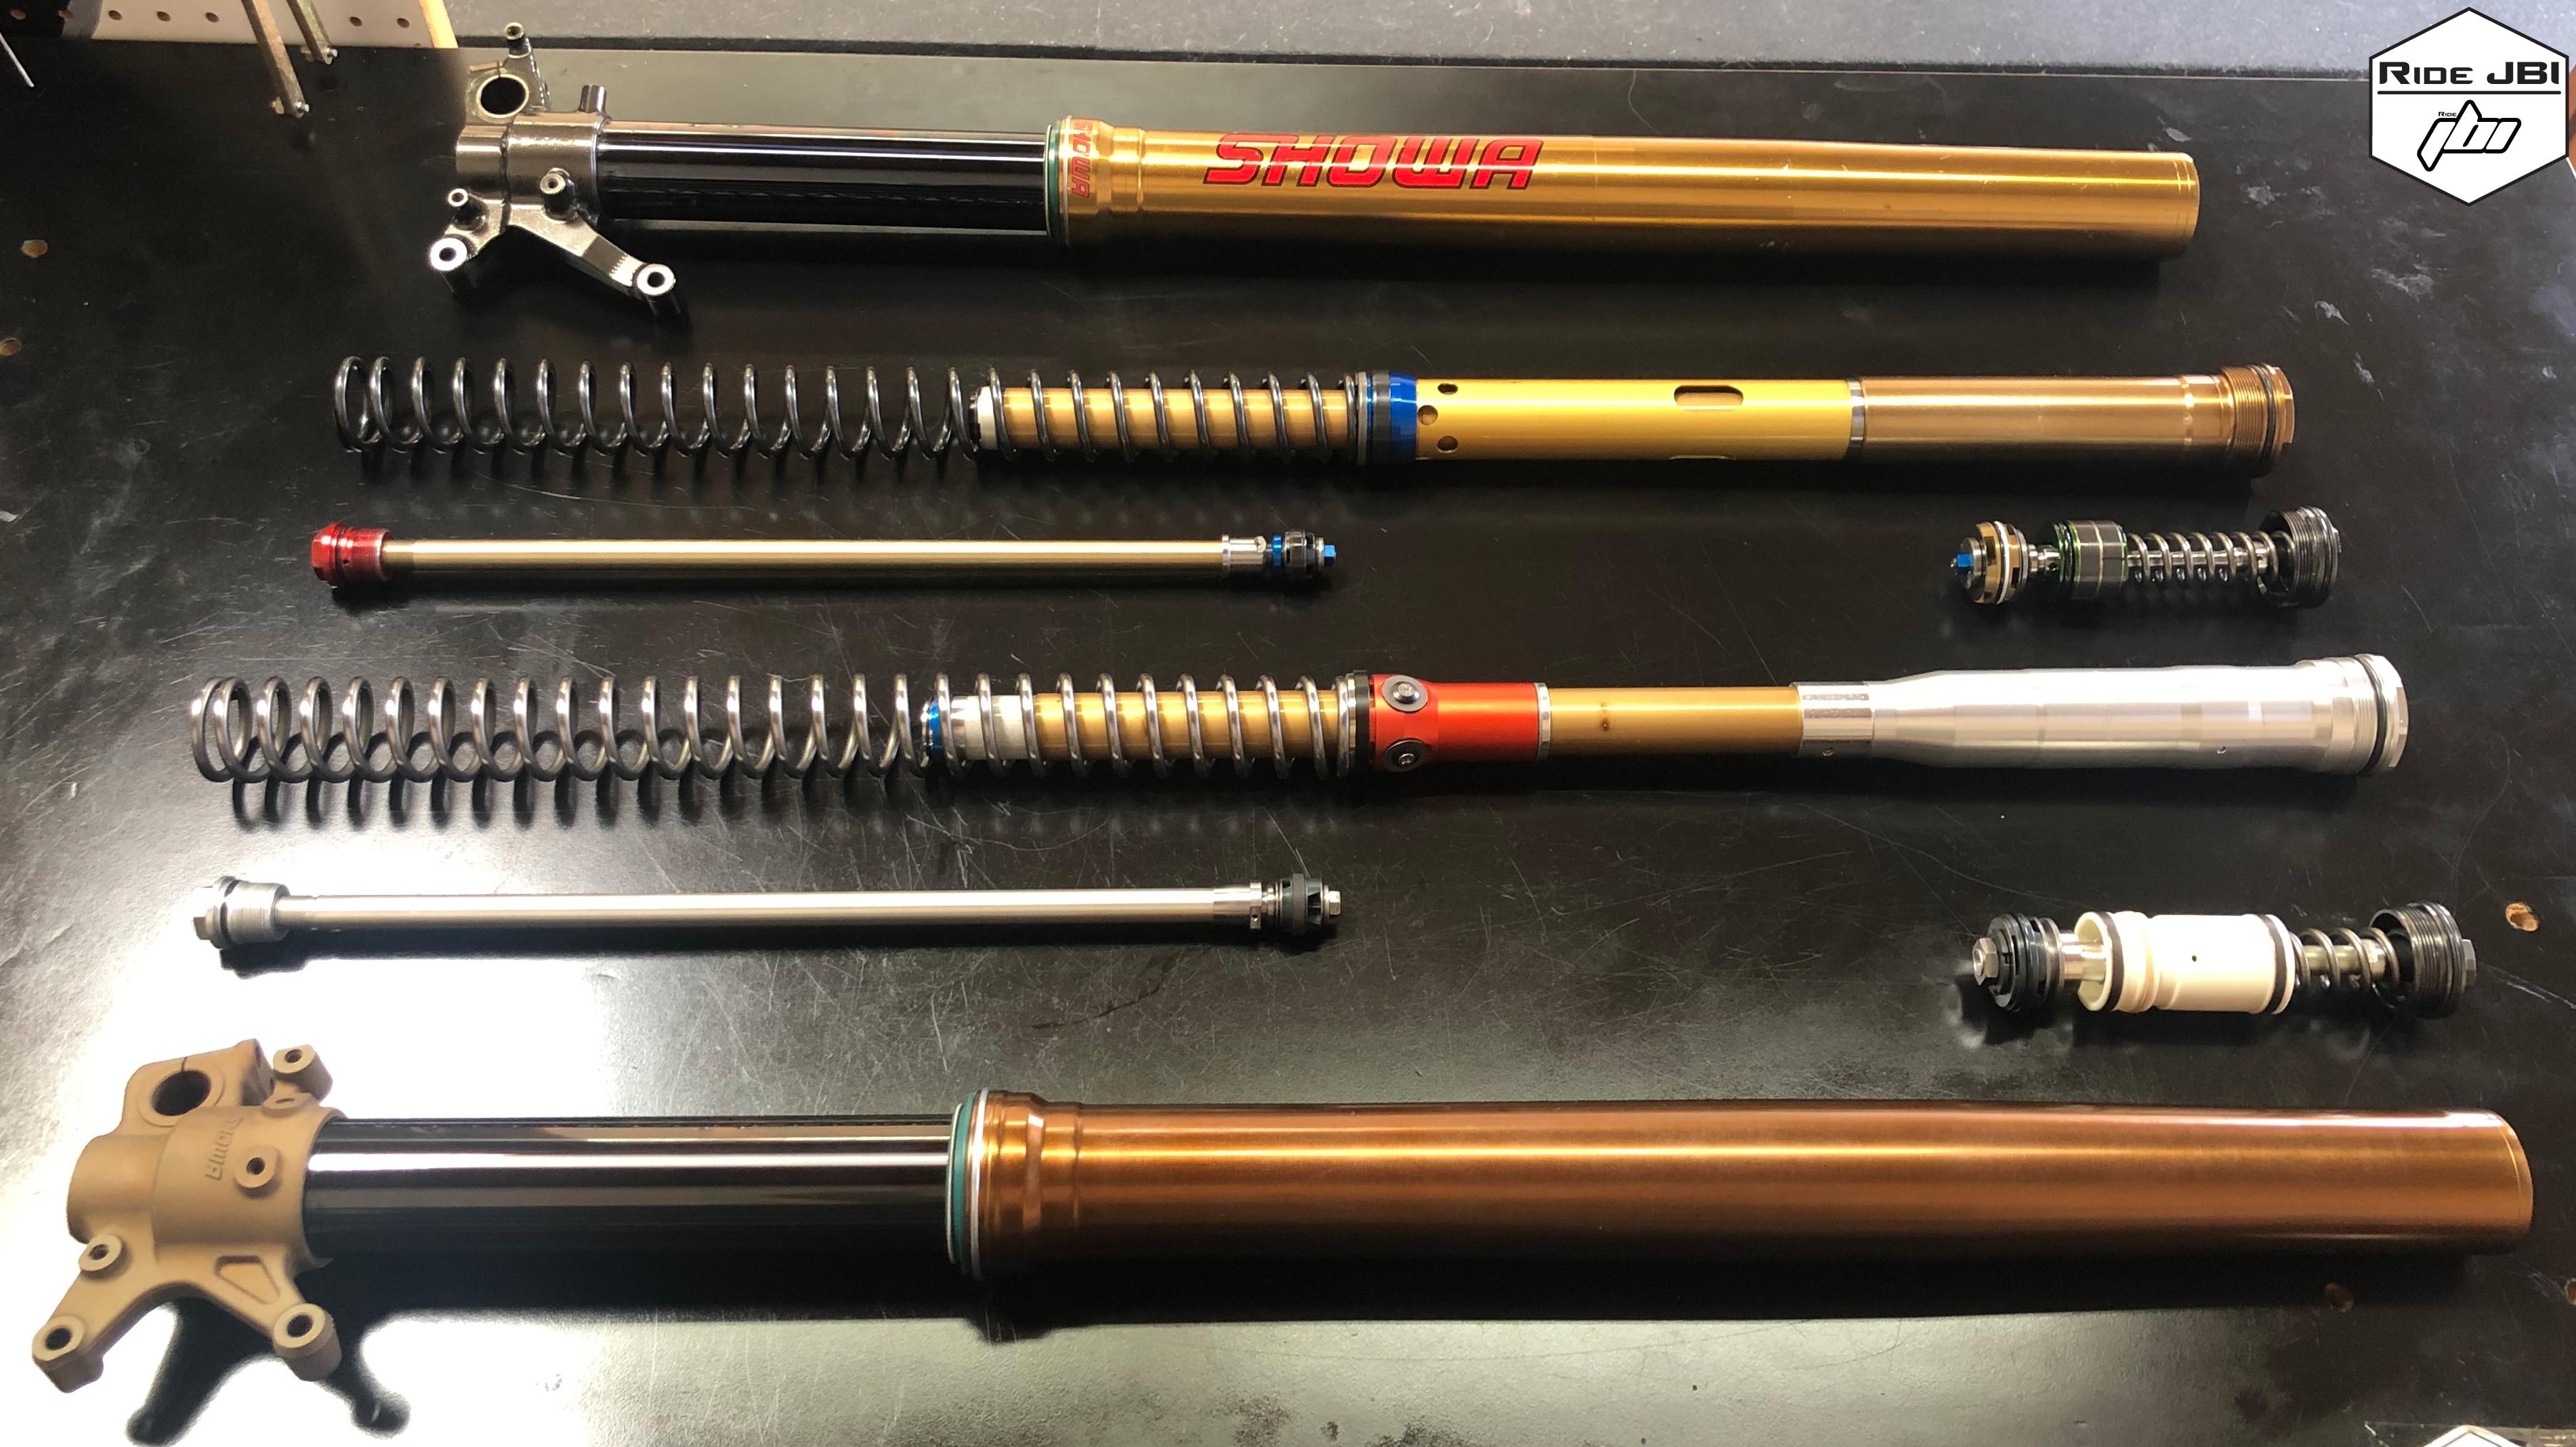 A Kit Showa 49mm Fork vs OEM Showa 49mm Spring Fork